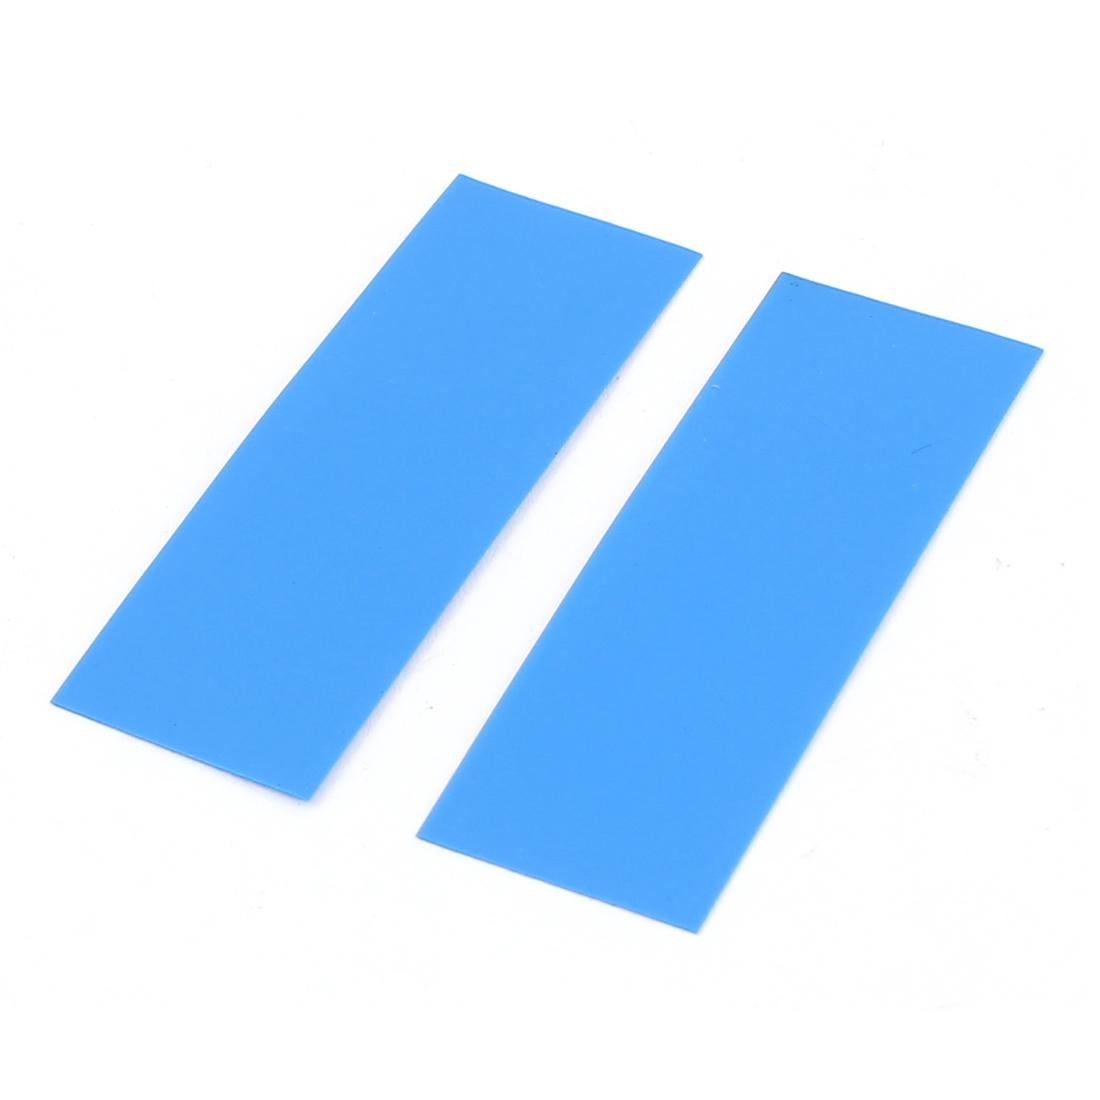 50pcs 17mm 10.8mm Dia PVC Heat Shrink Tubing Blue for Single AAA Battery